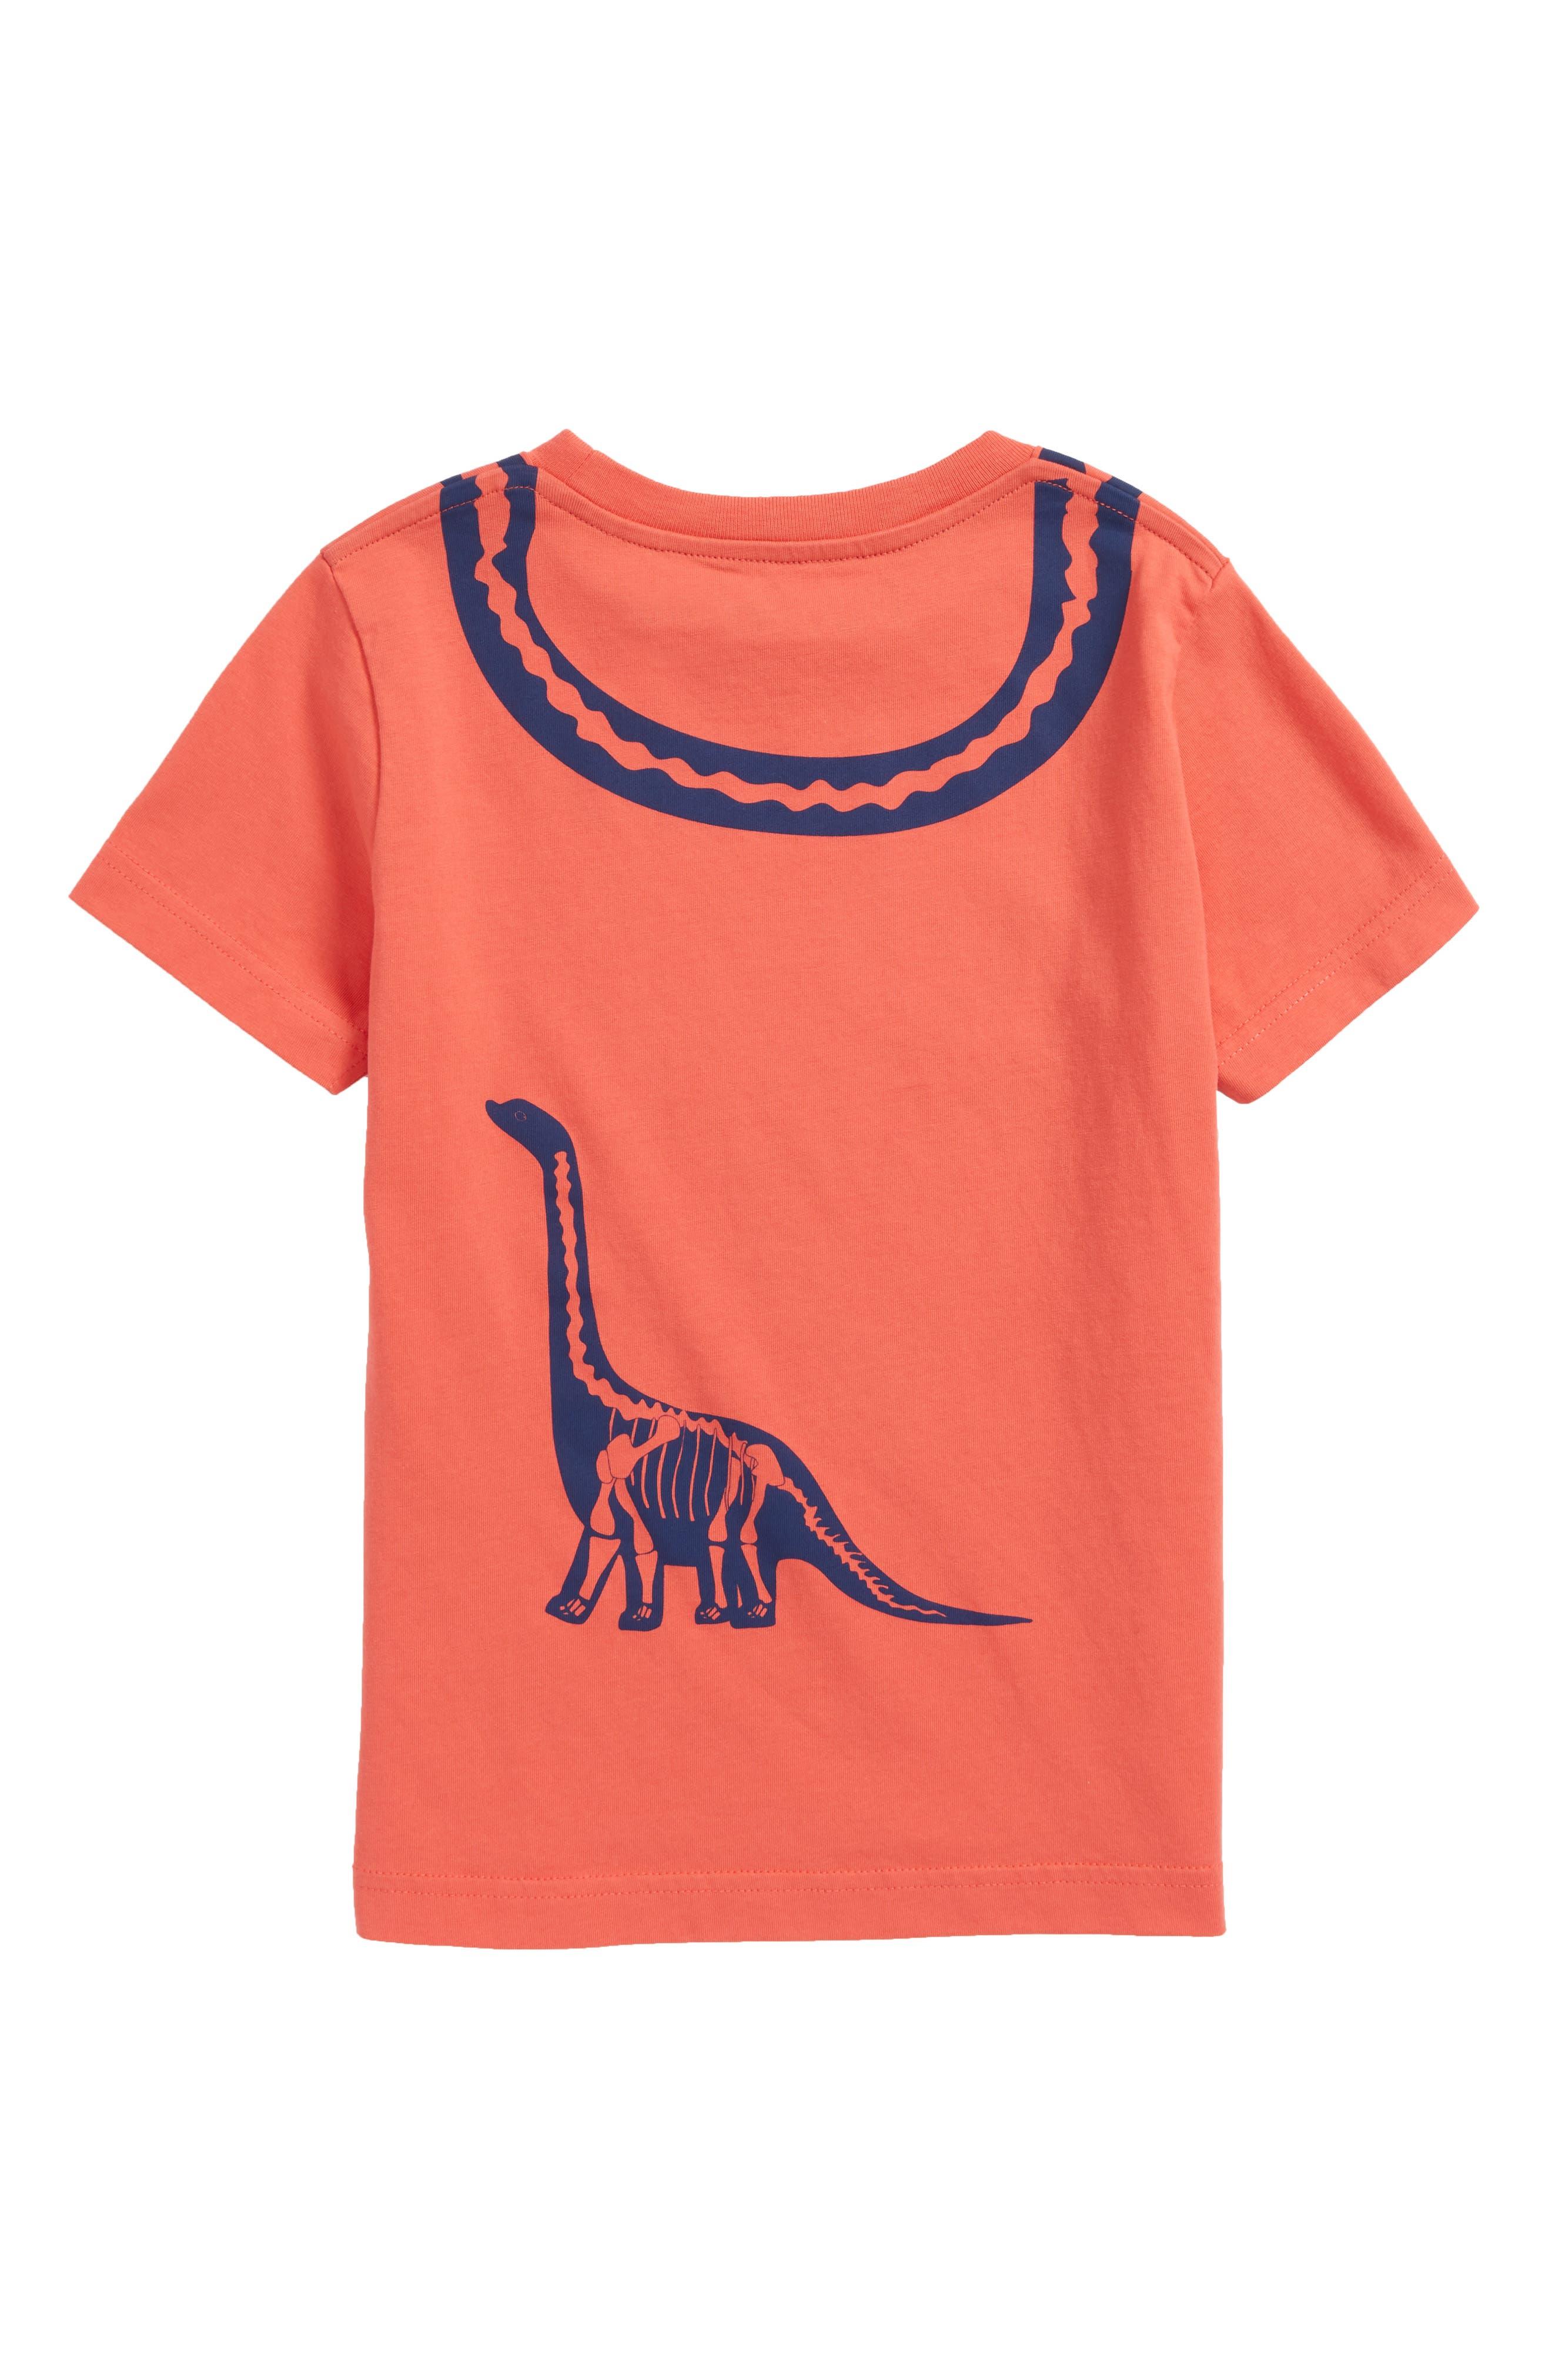 MINI BODEN,                             Wraparound Dinosaur Graphic T-Shirt,                             Alternate thumbnail 2, color,                             614